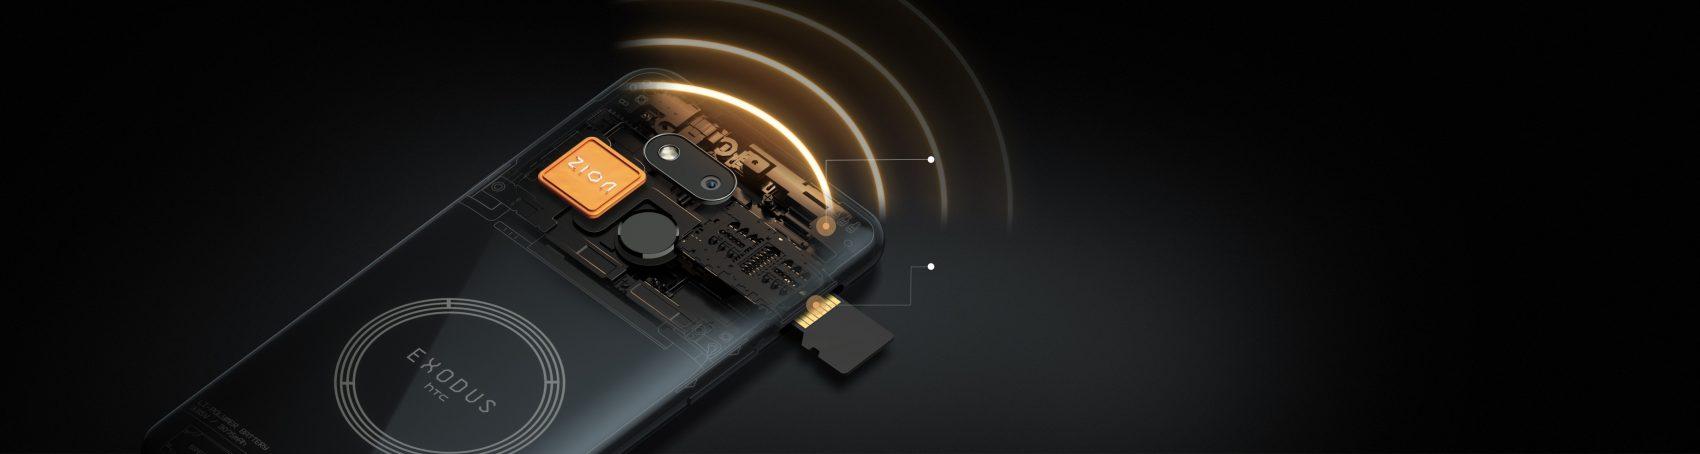 HTC exodus 1s cryptofalka